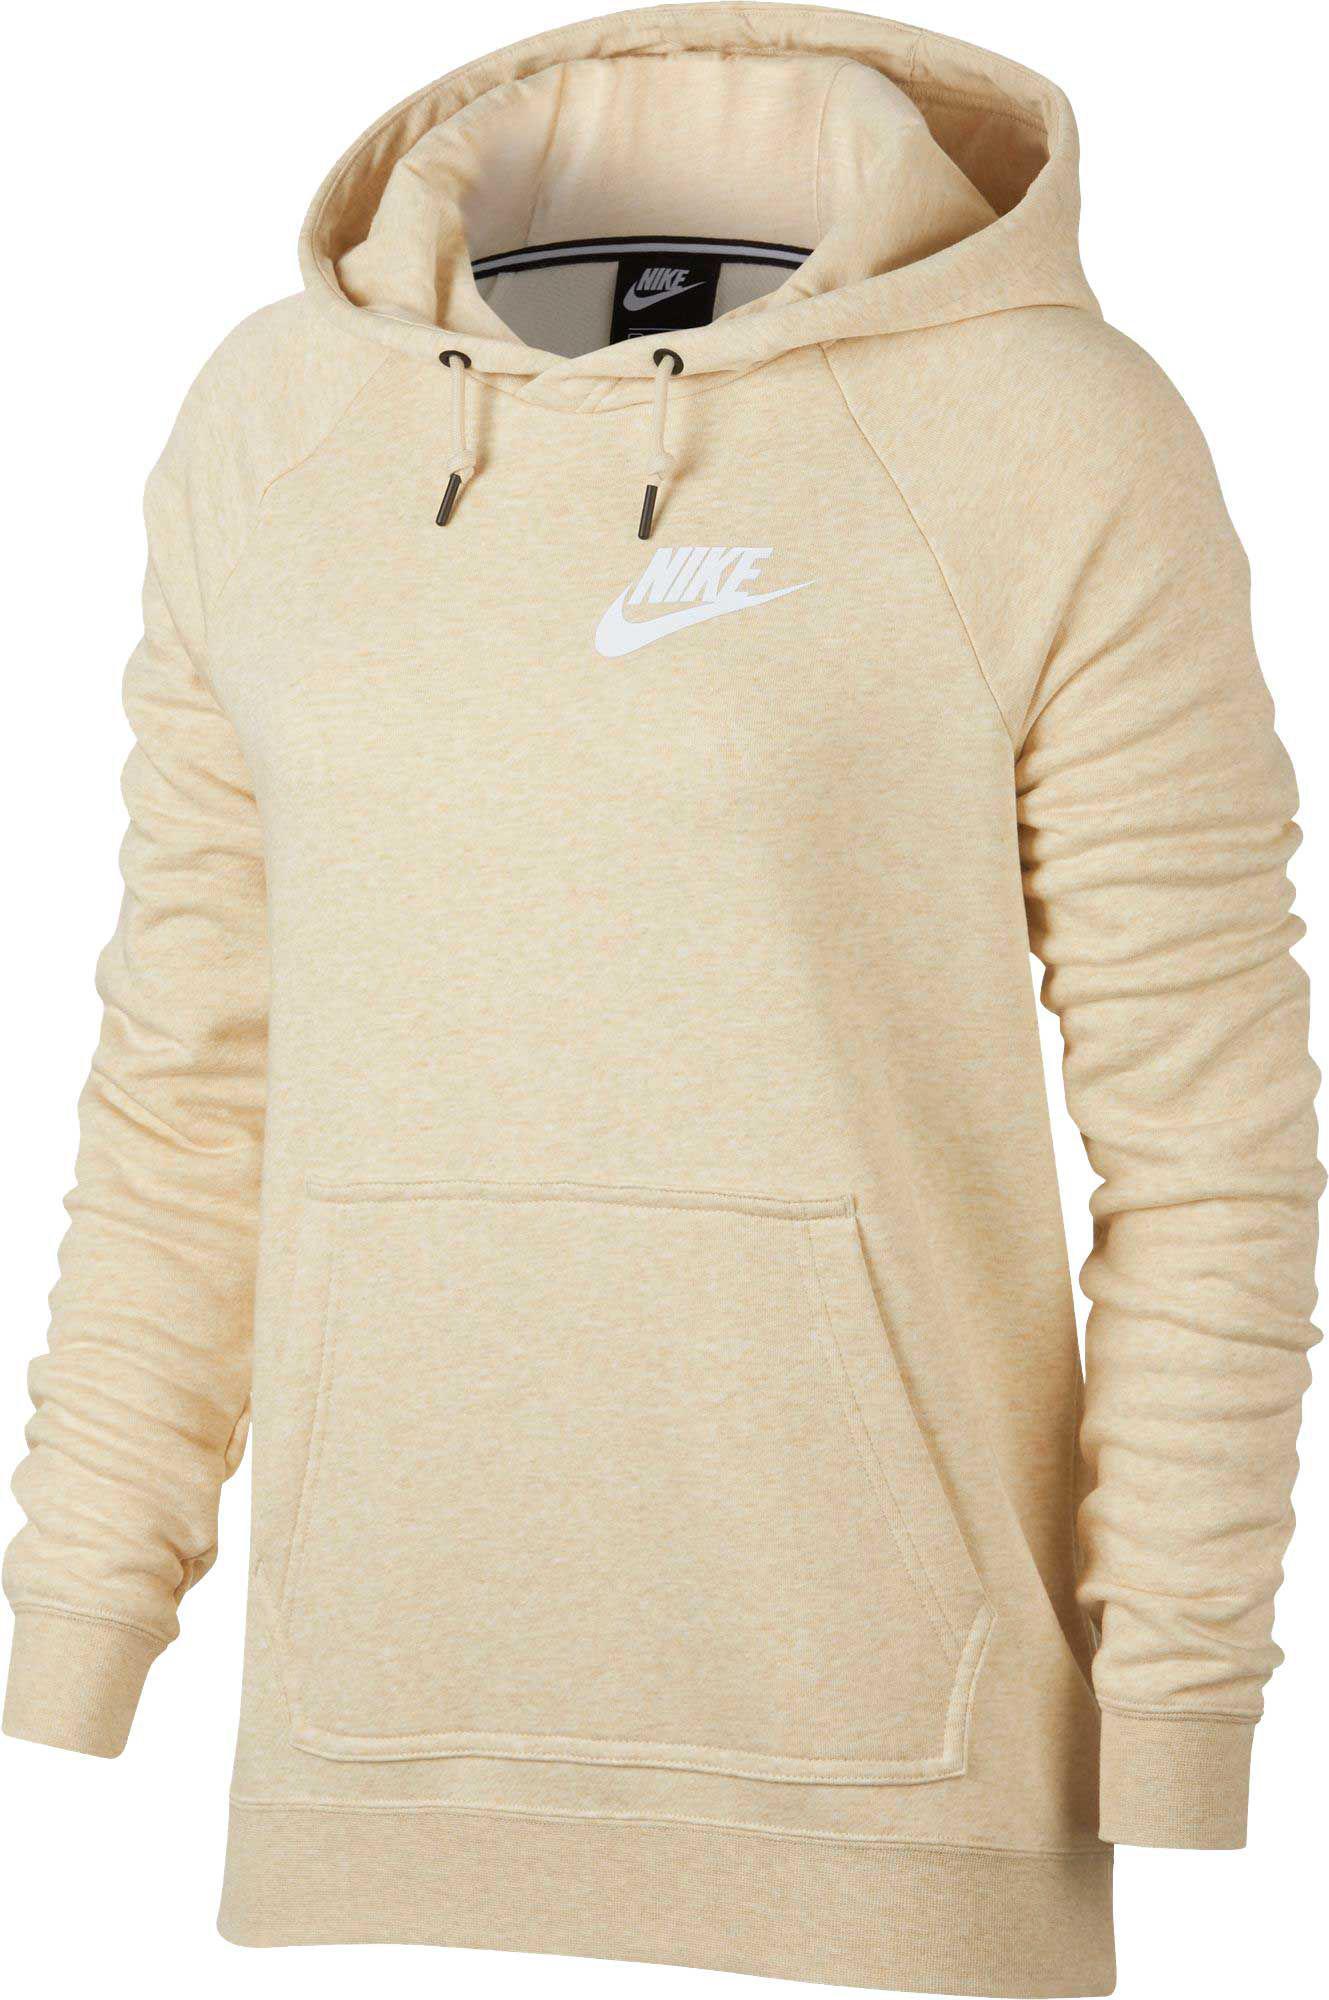 ae1e173650ee2 Nike Sportswear Rally Hoodie in Natural - Lyst